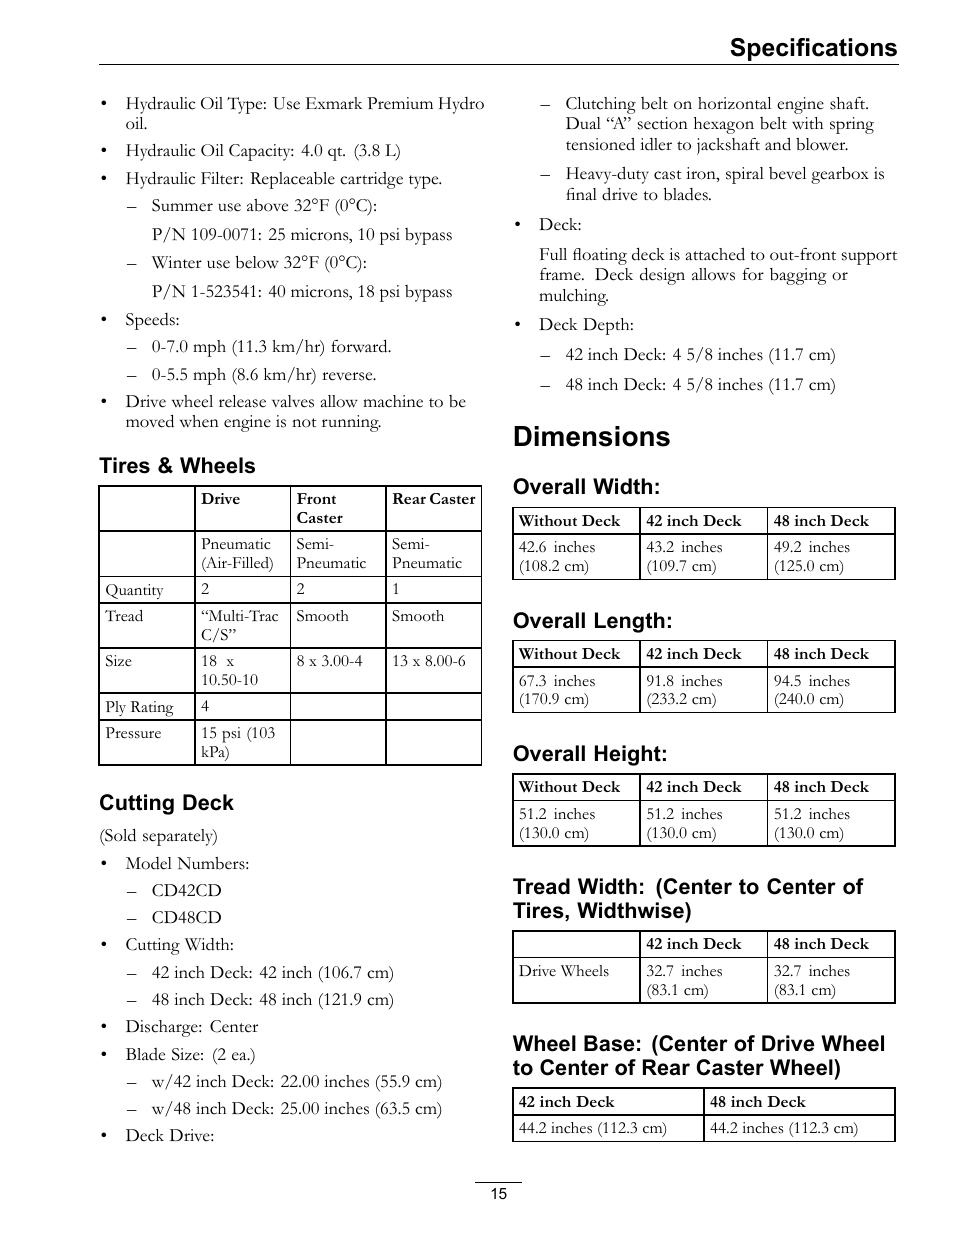 dimensions specifications exmark navigator 0 user manual page rh manualsdir com exmark navigator manuel exmark navigator manuel